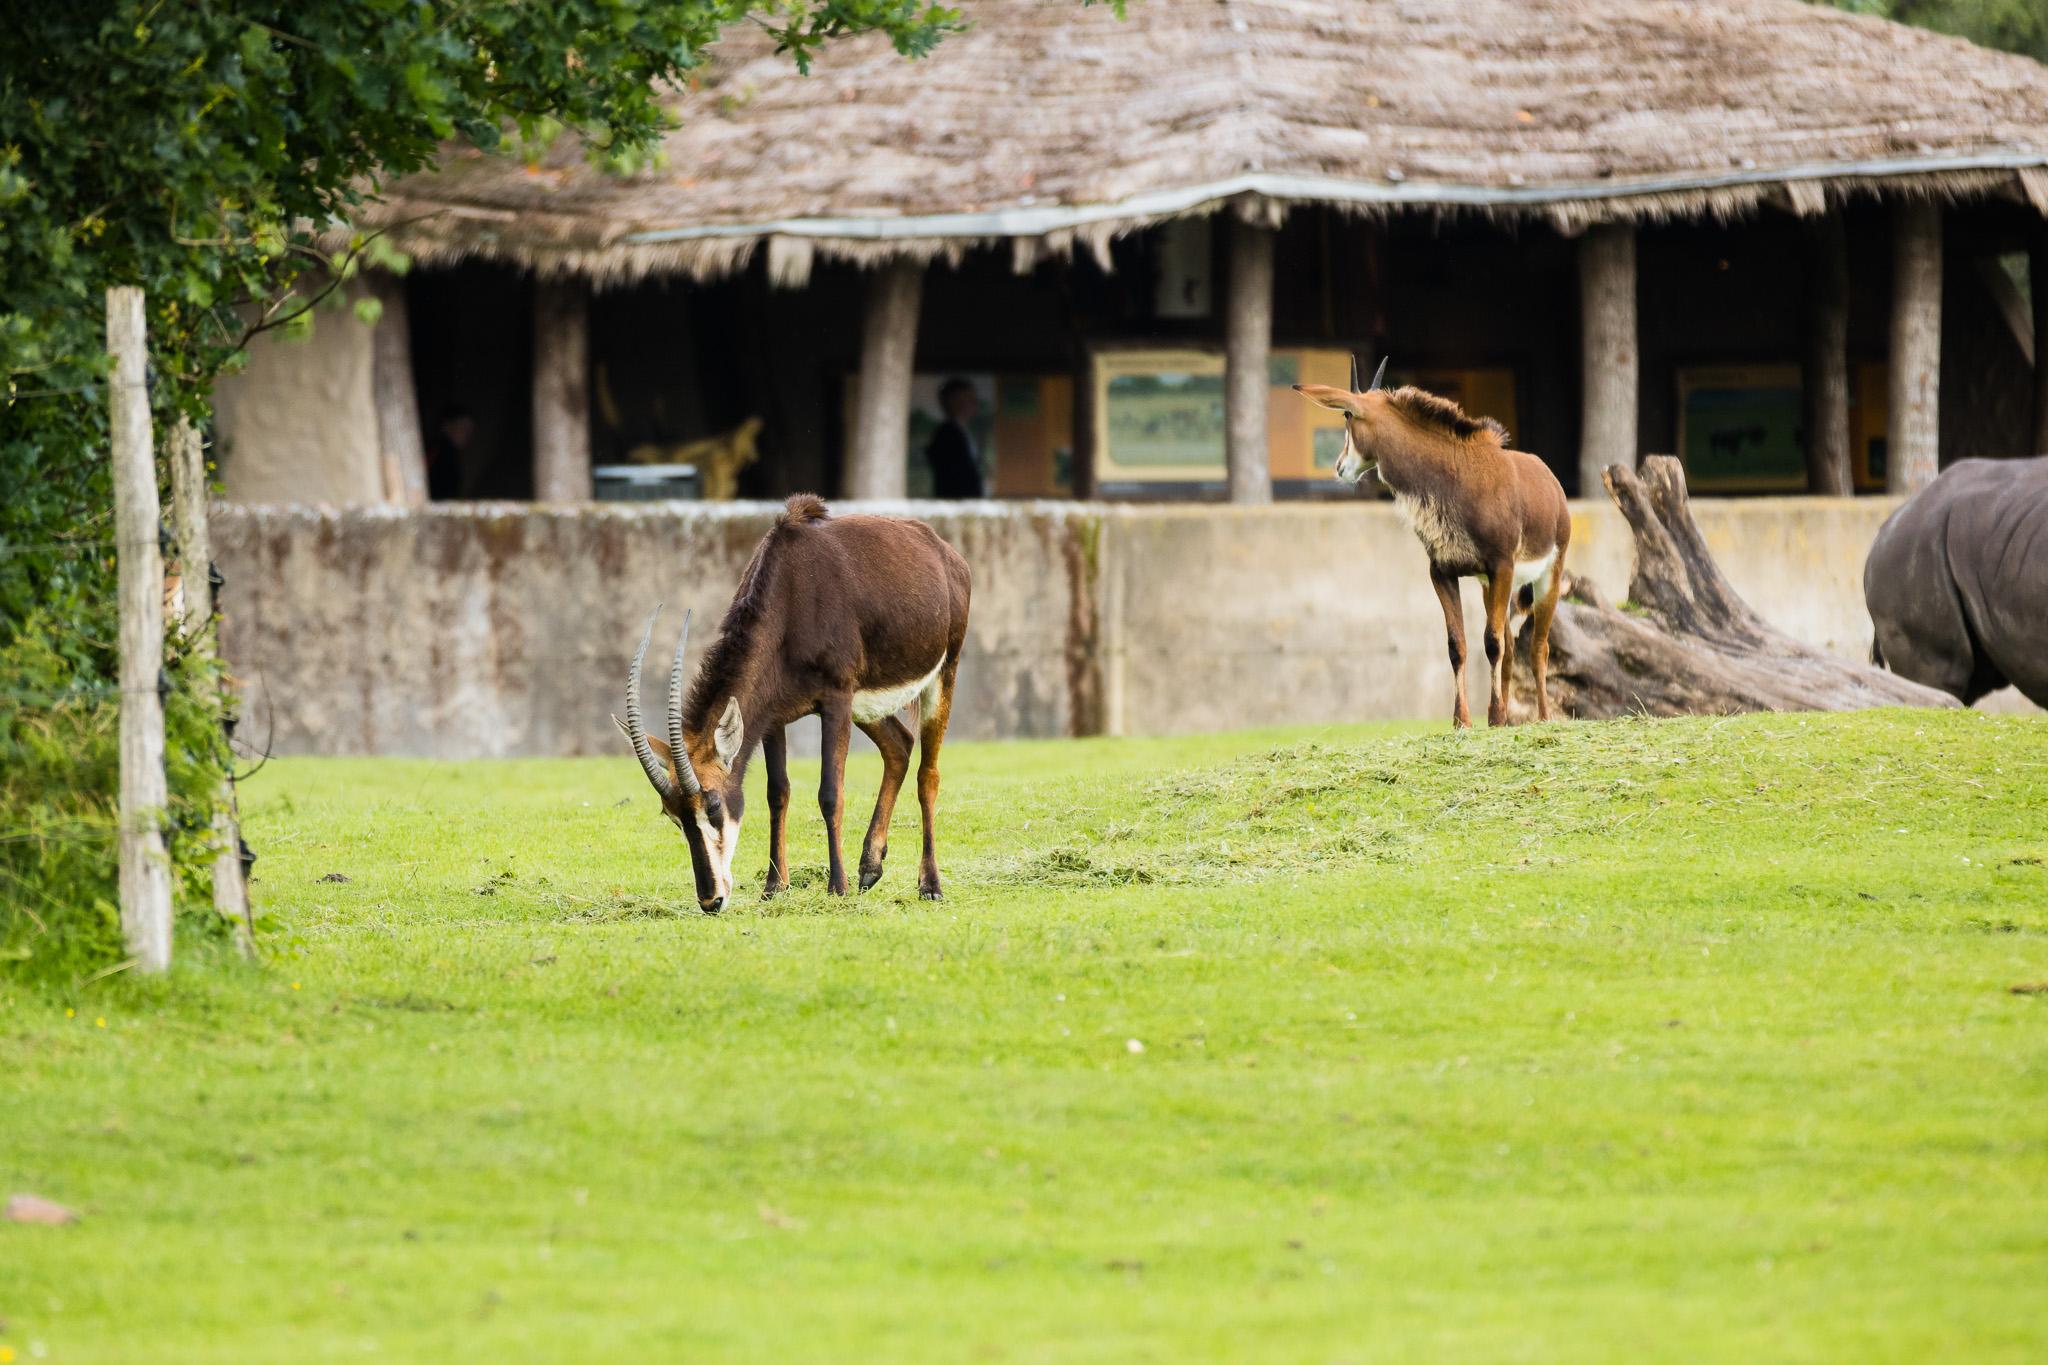 Givskud-Zoo-Safari-NorthernWorkshops-10.jpg